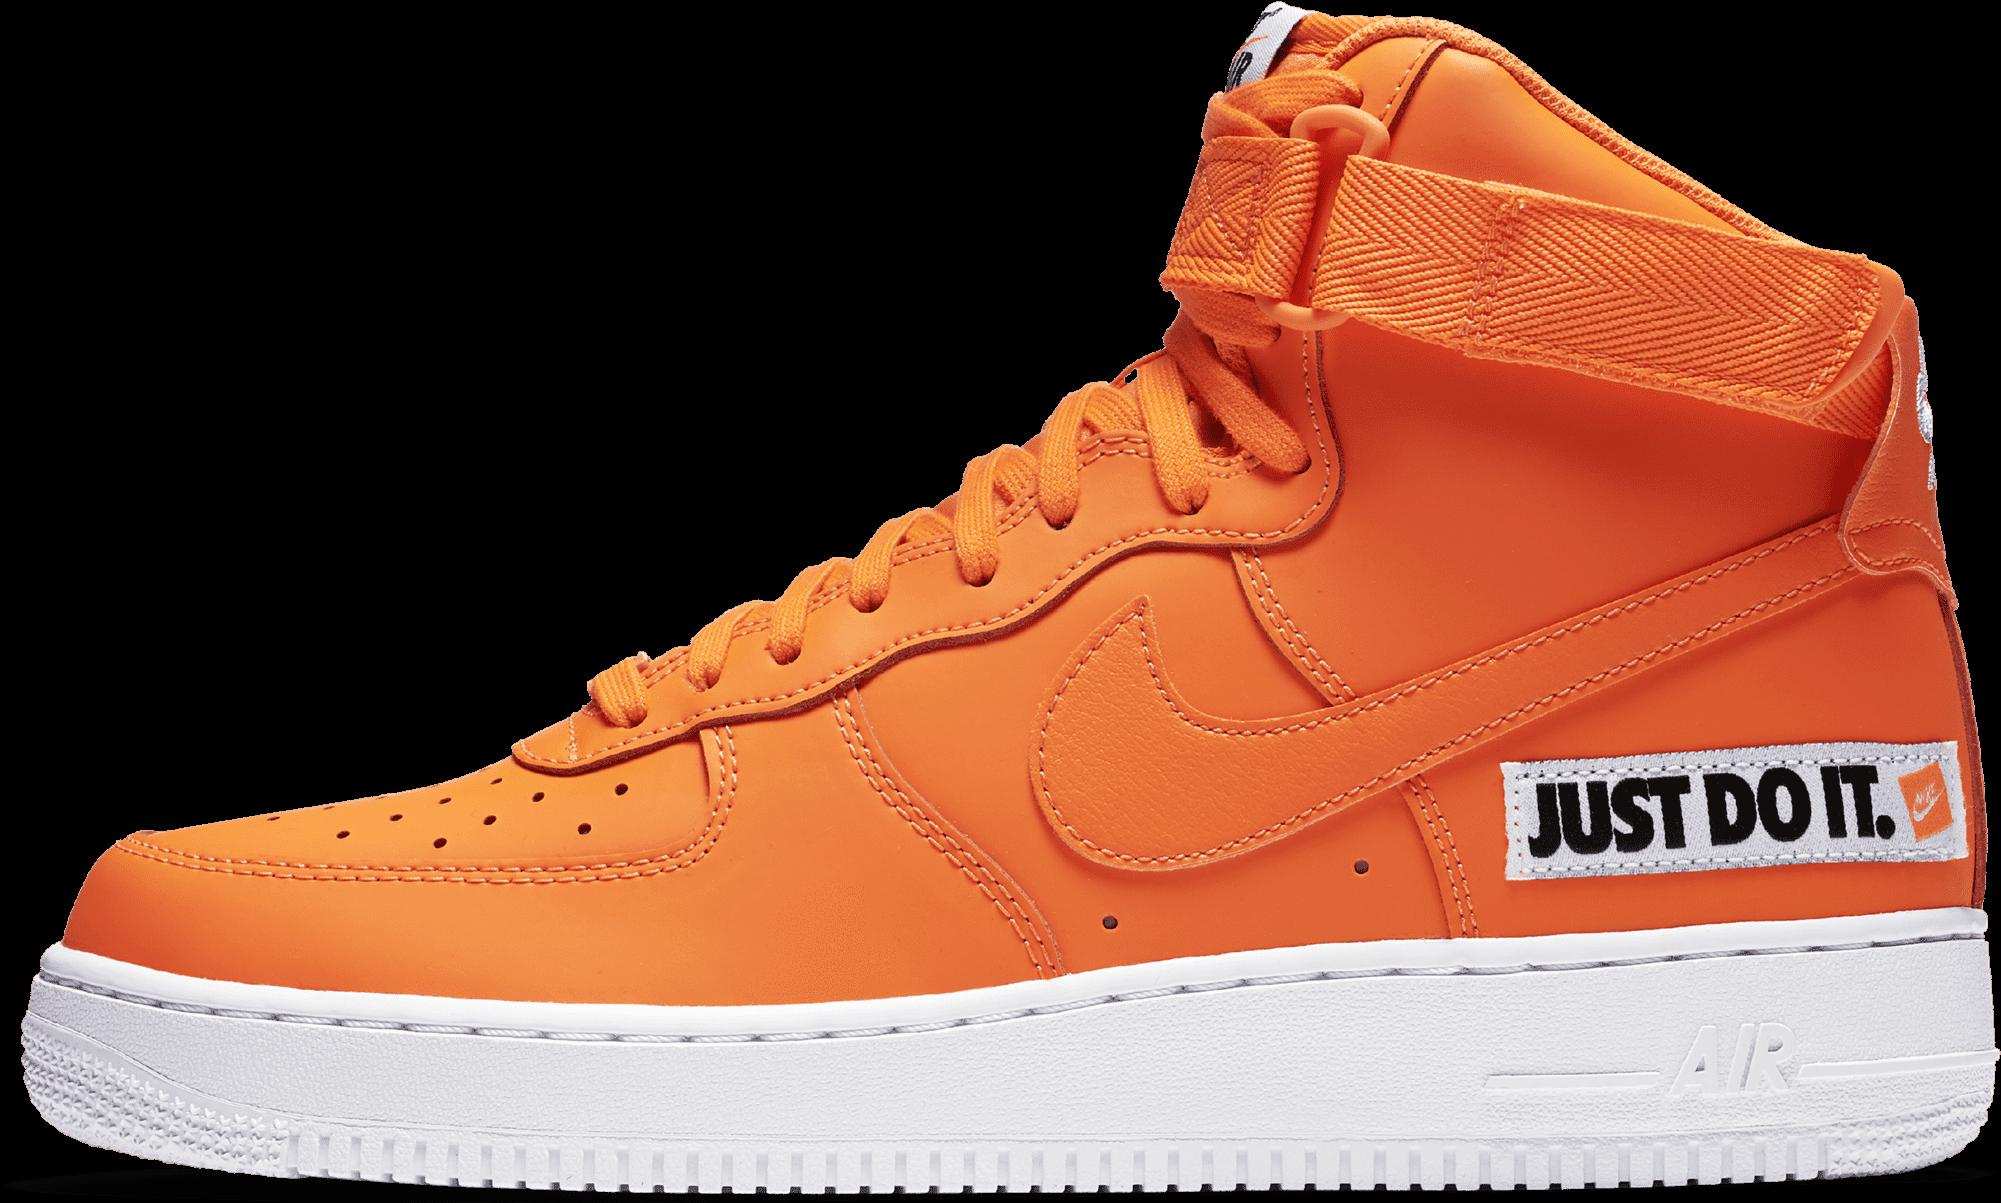 07 Lv8 Jdi Leather - Nike Air Force 1